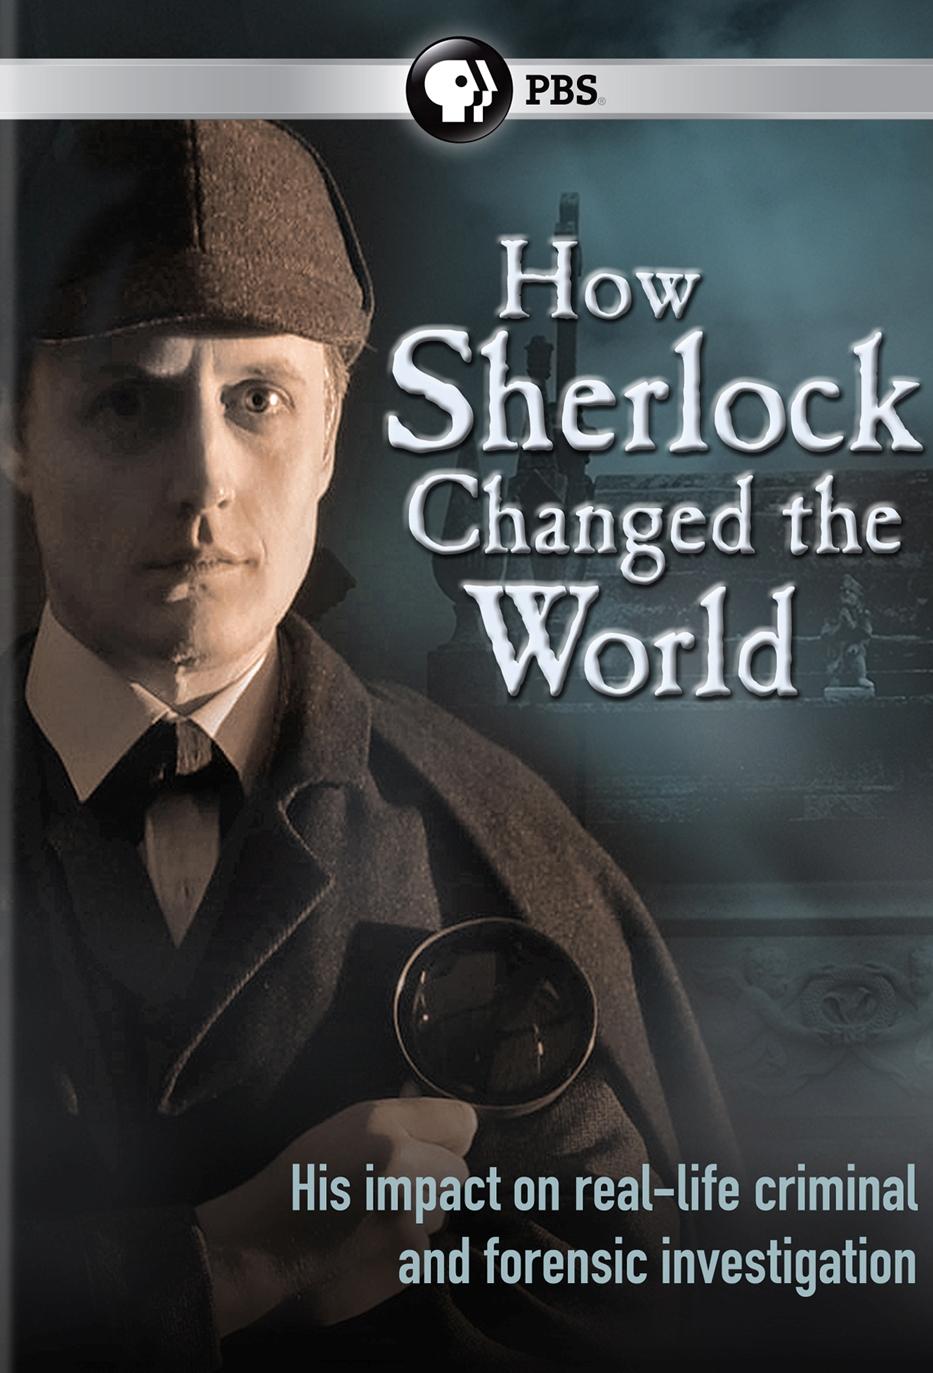 How Sherlock Changed the World